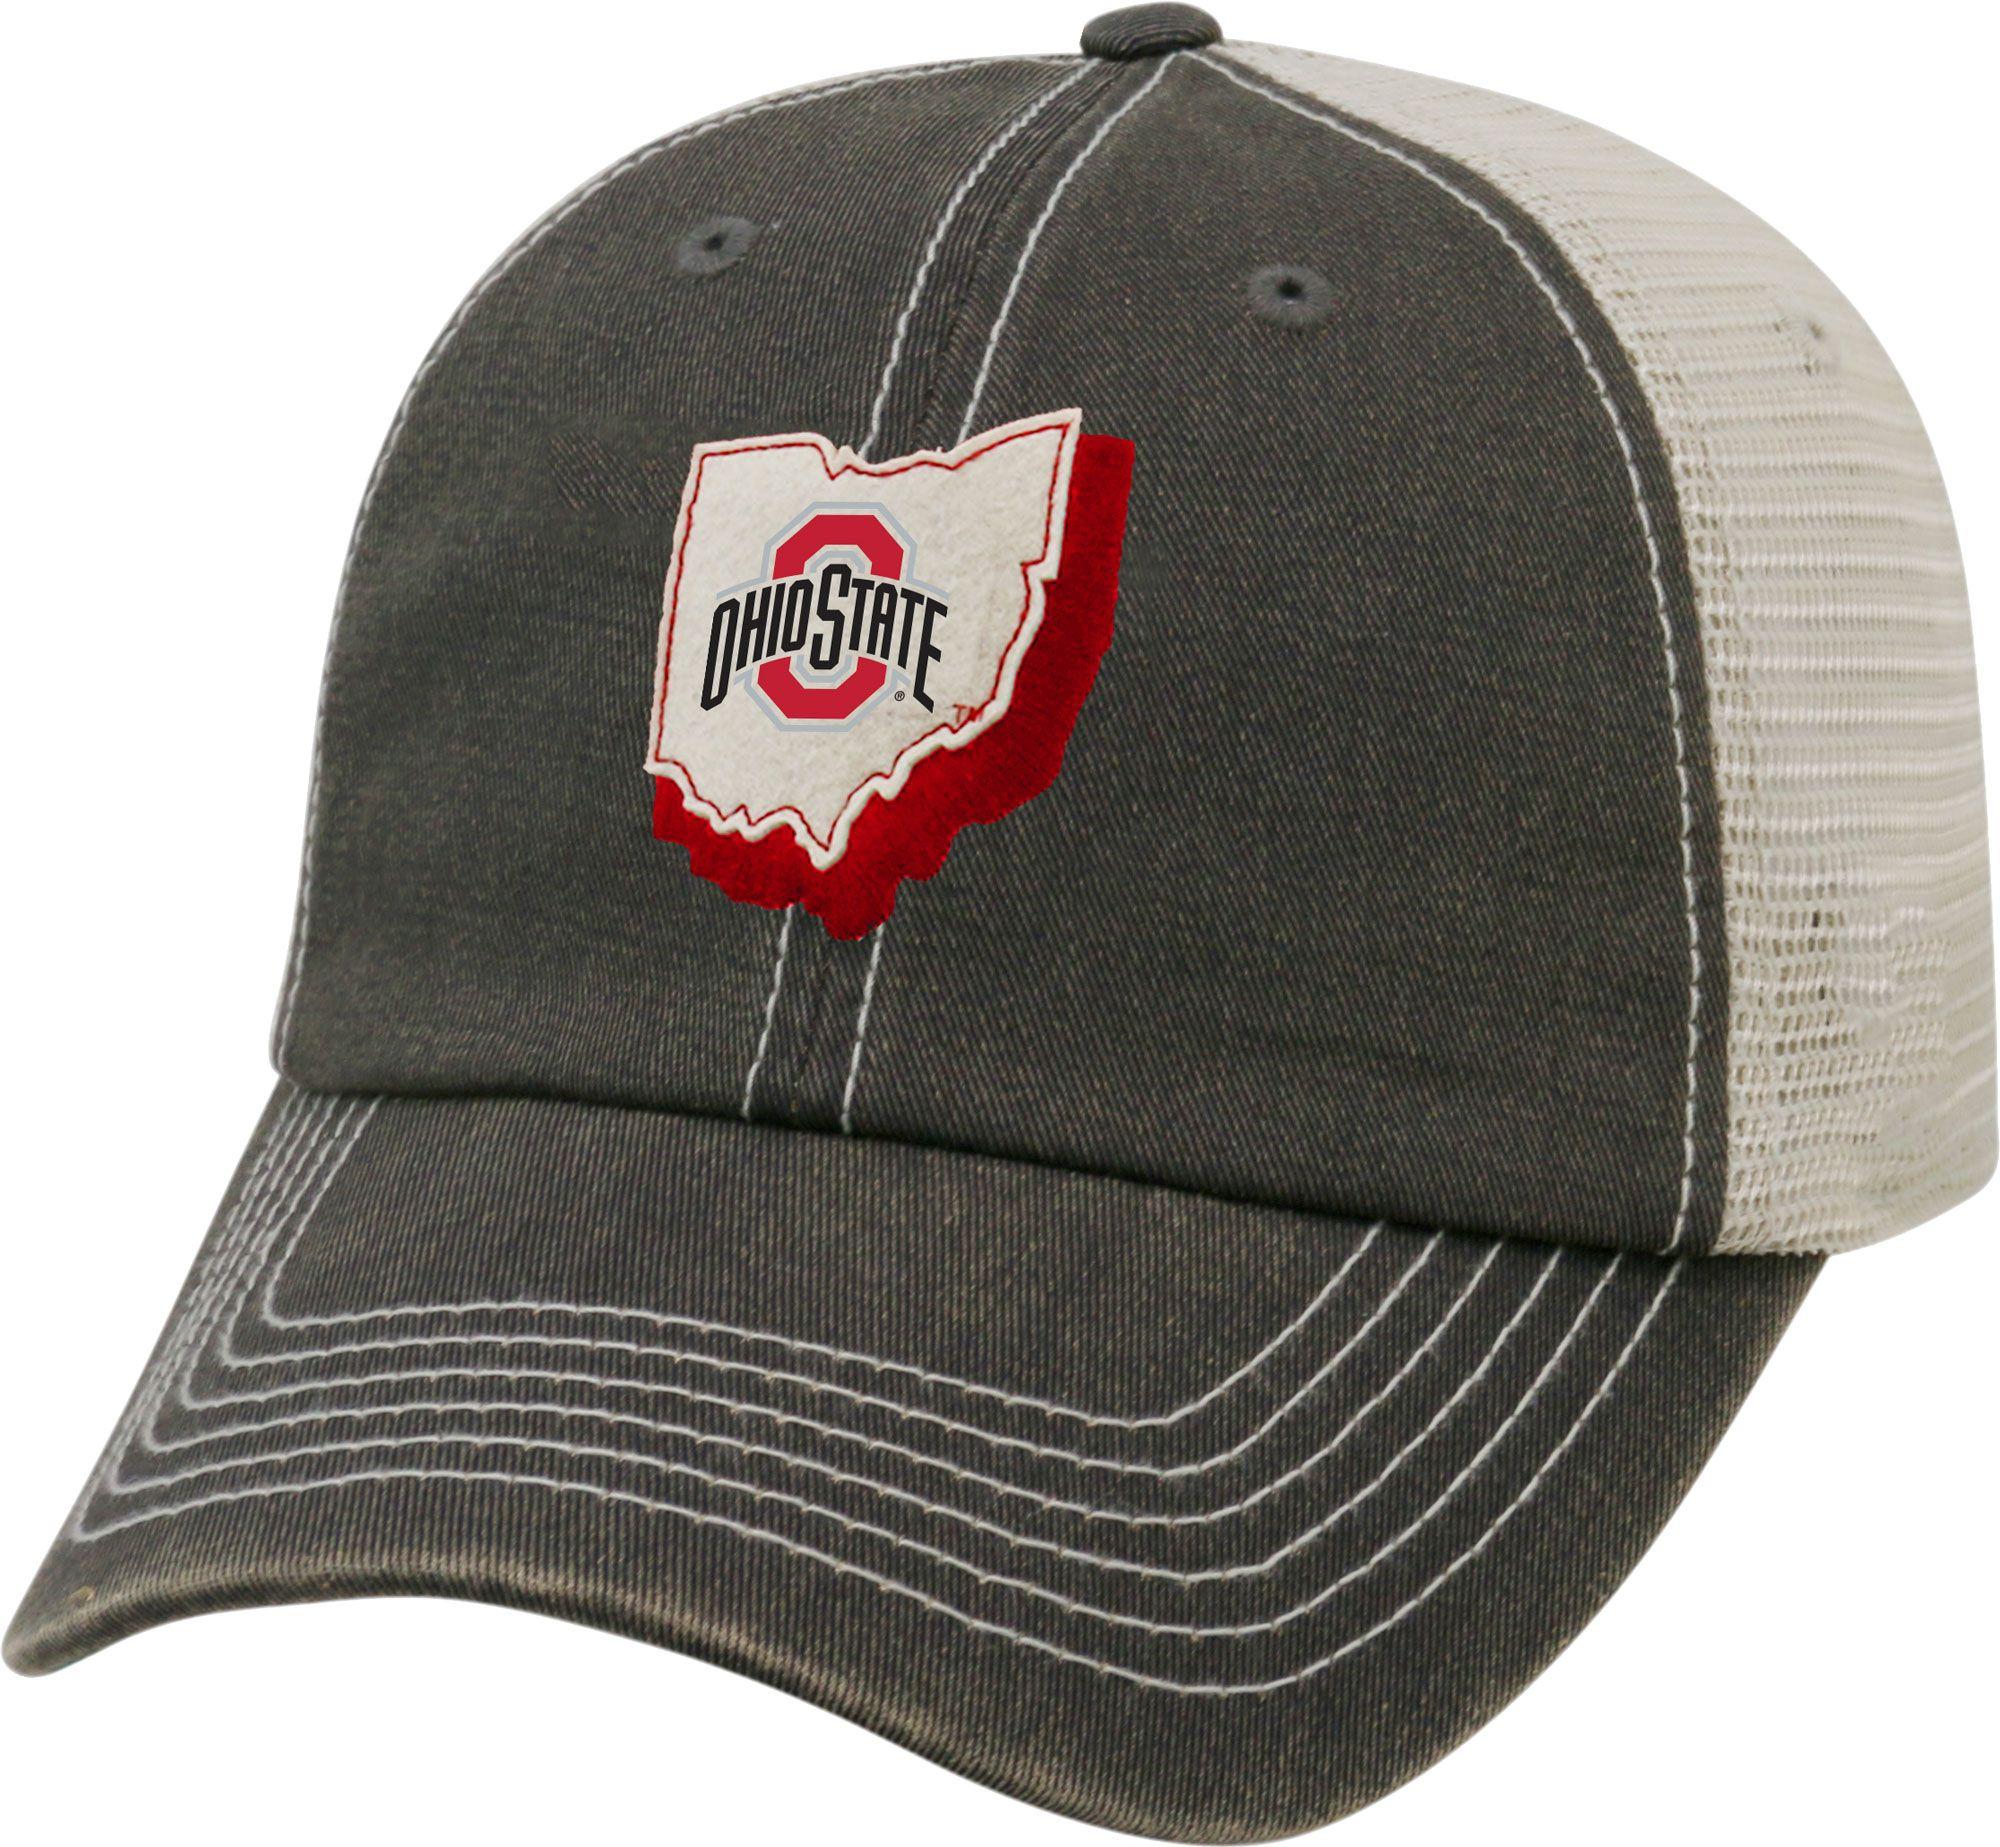 info for 7de3b deaab ... ireland top of the world mens ohio state buckeyes gray united  adjustable snapback hat 96987 2c6d2